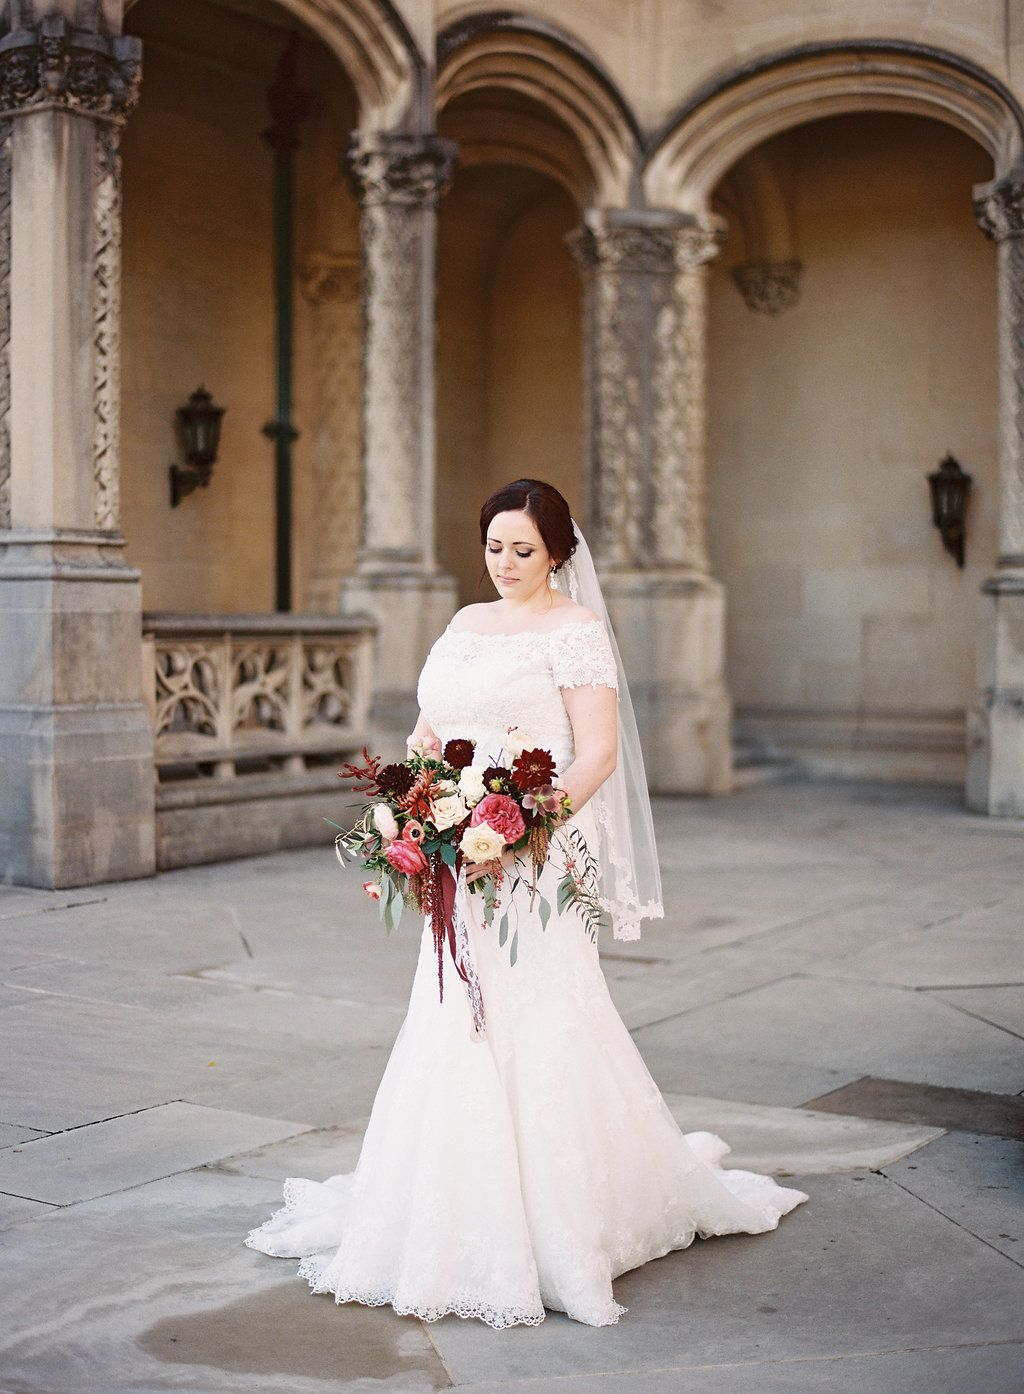 Harry potter wedding dress  The Prettiest Harry Potter Inspired Wedding Weuve Ever Seen  HARRY